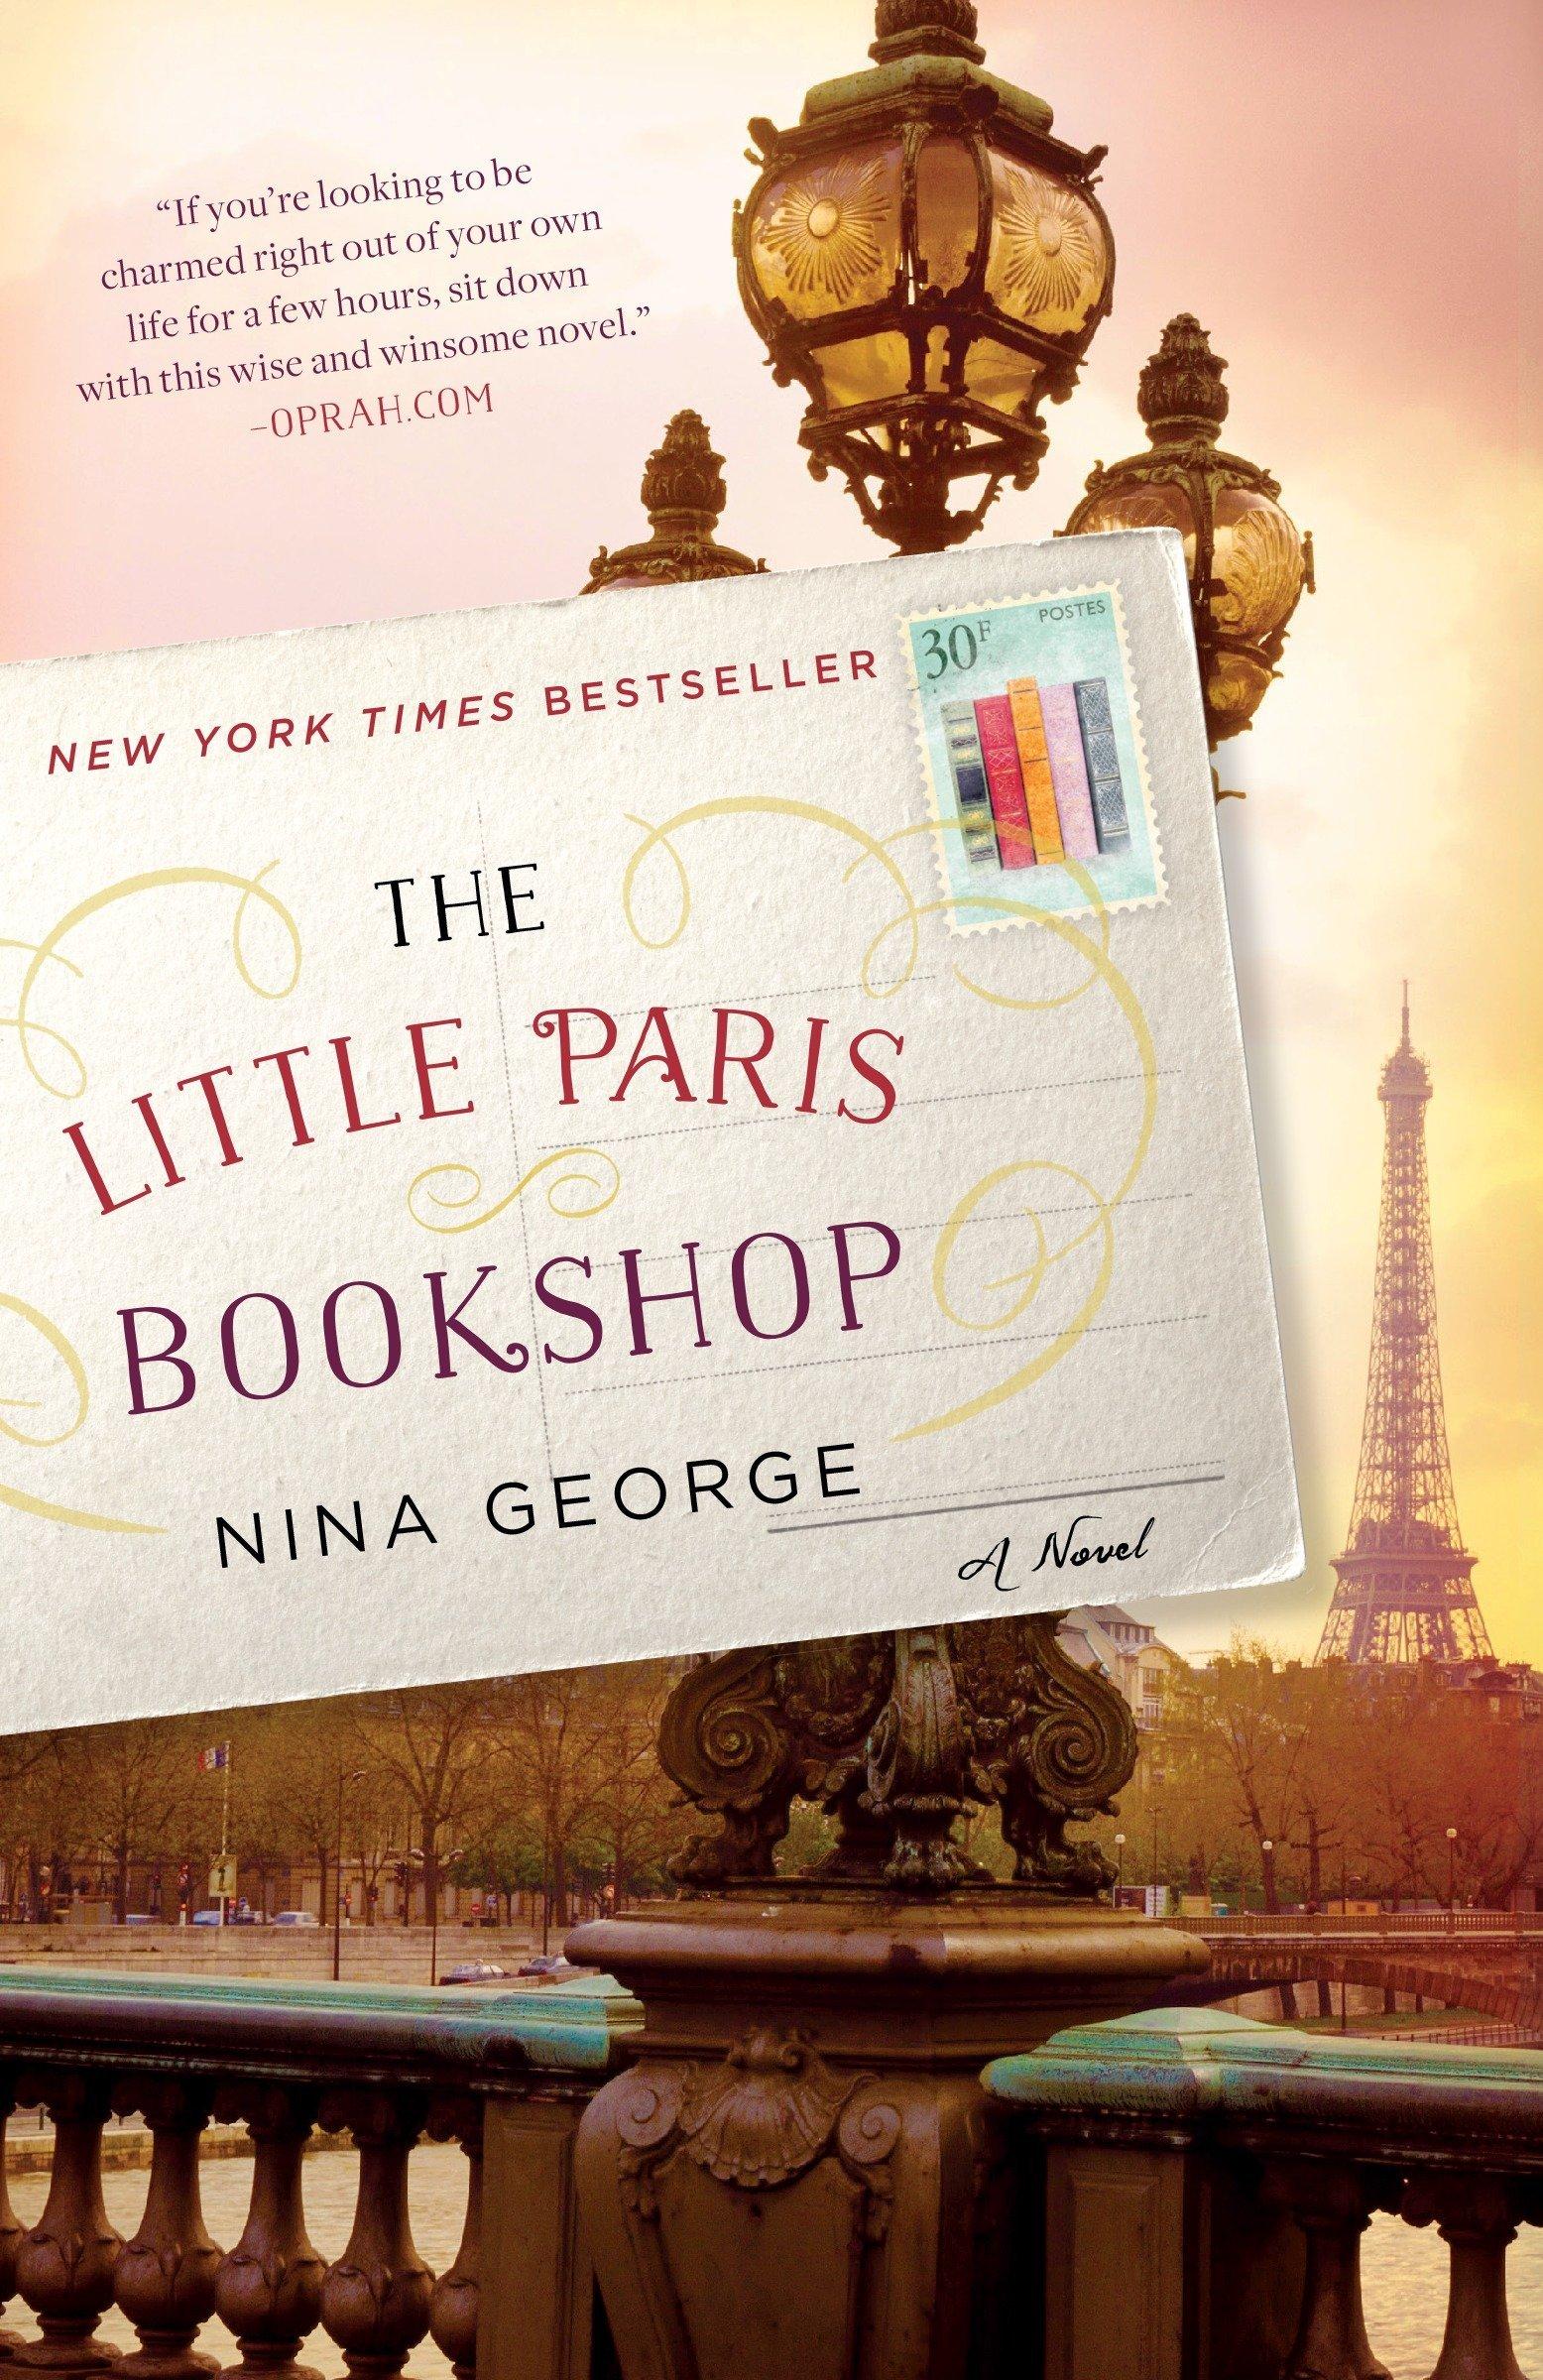 The Little Paris Bookshop: A Novel by Broadway Books